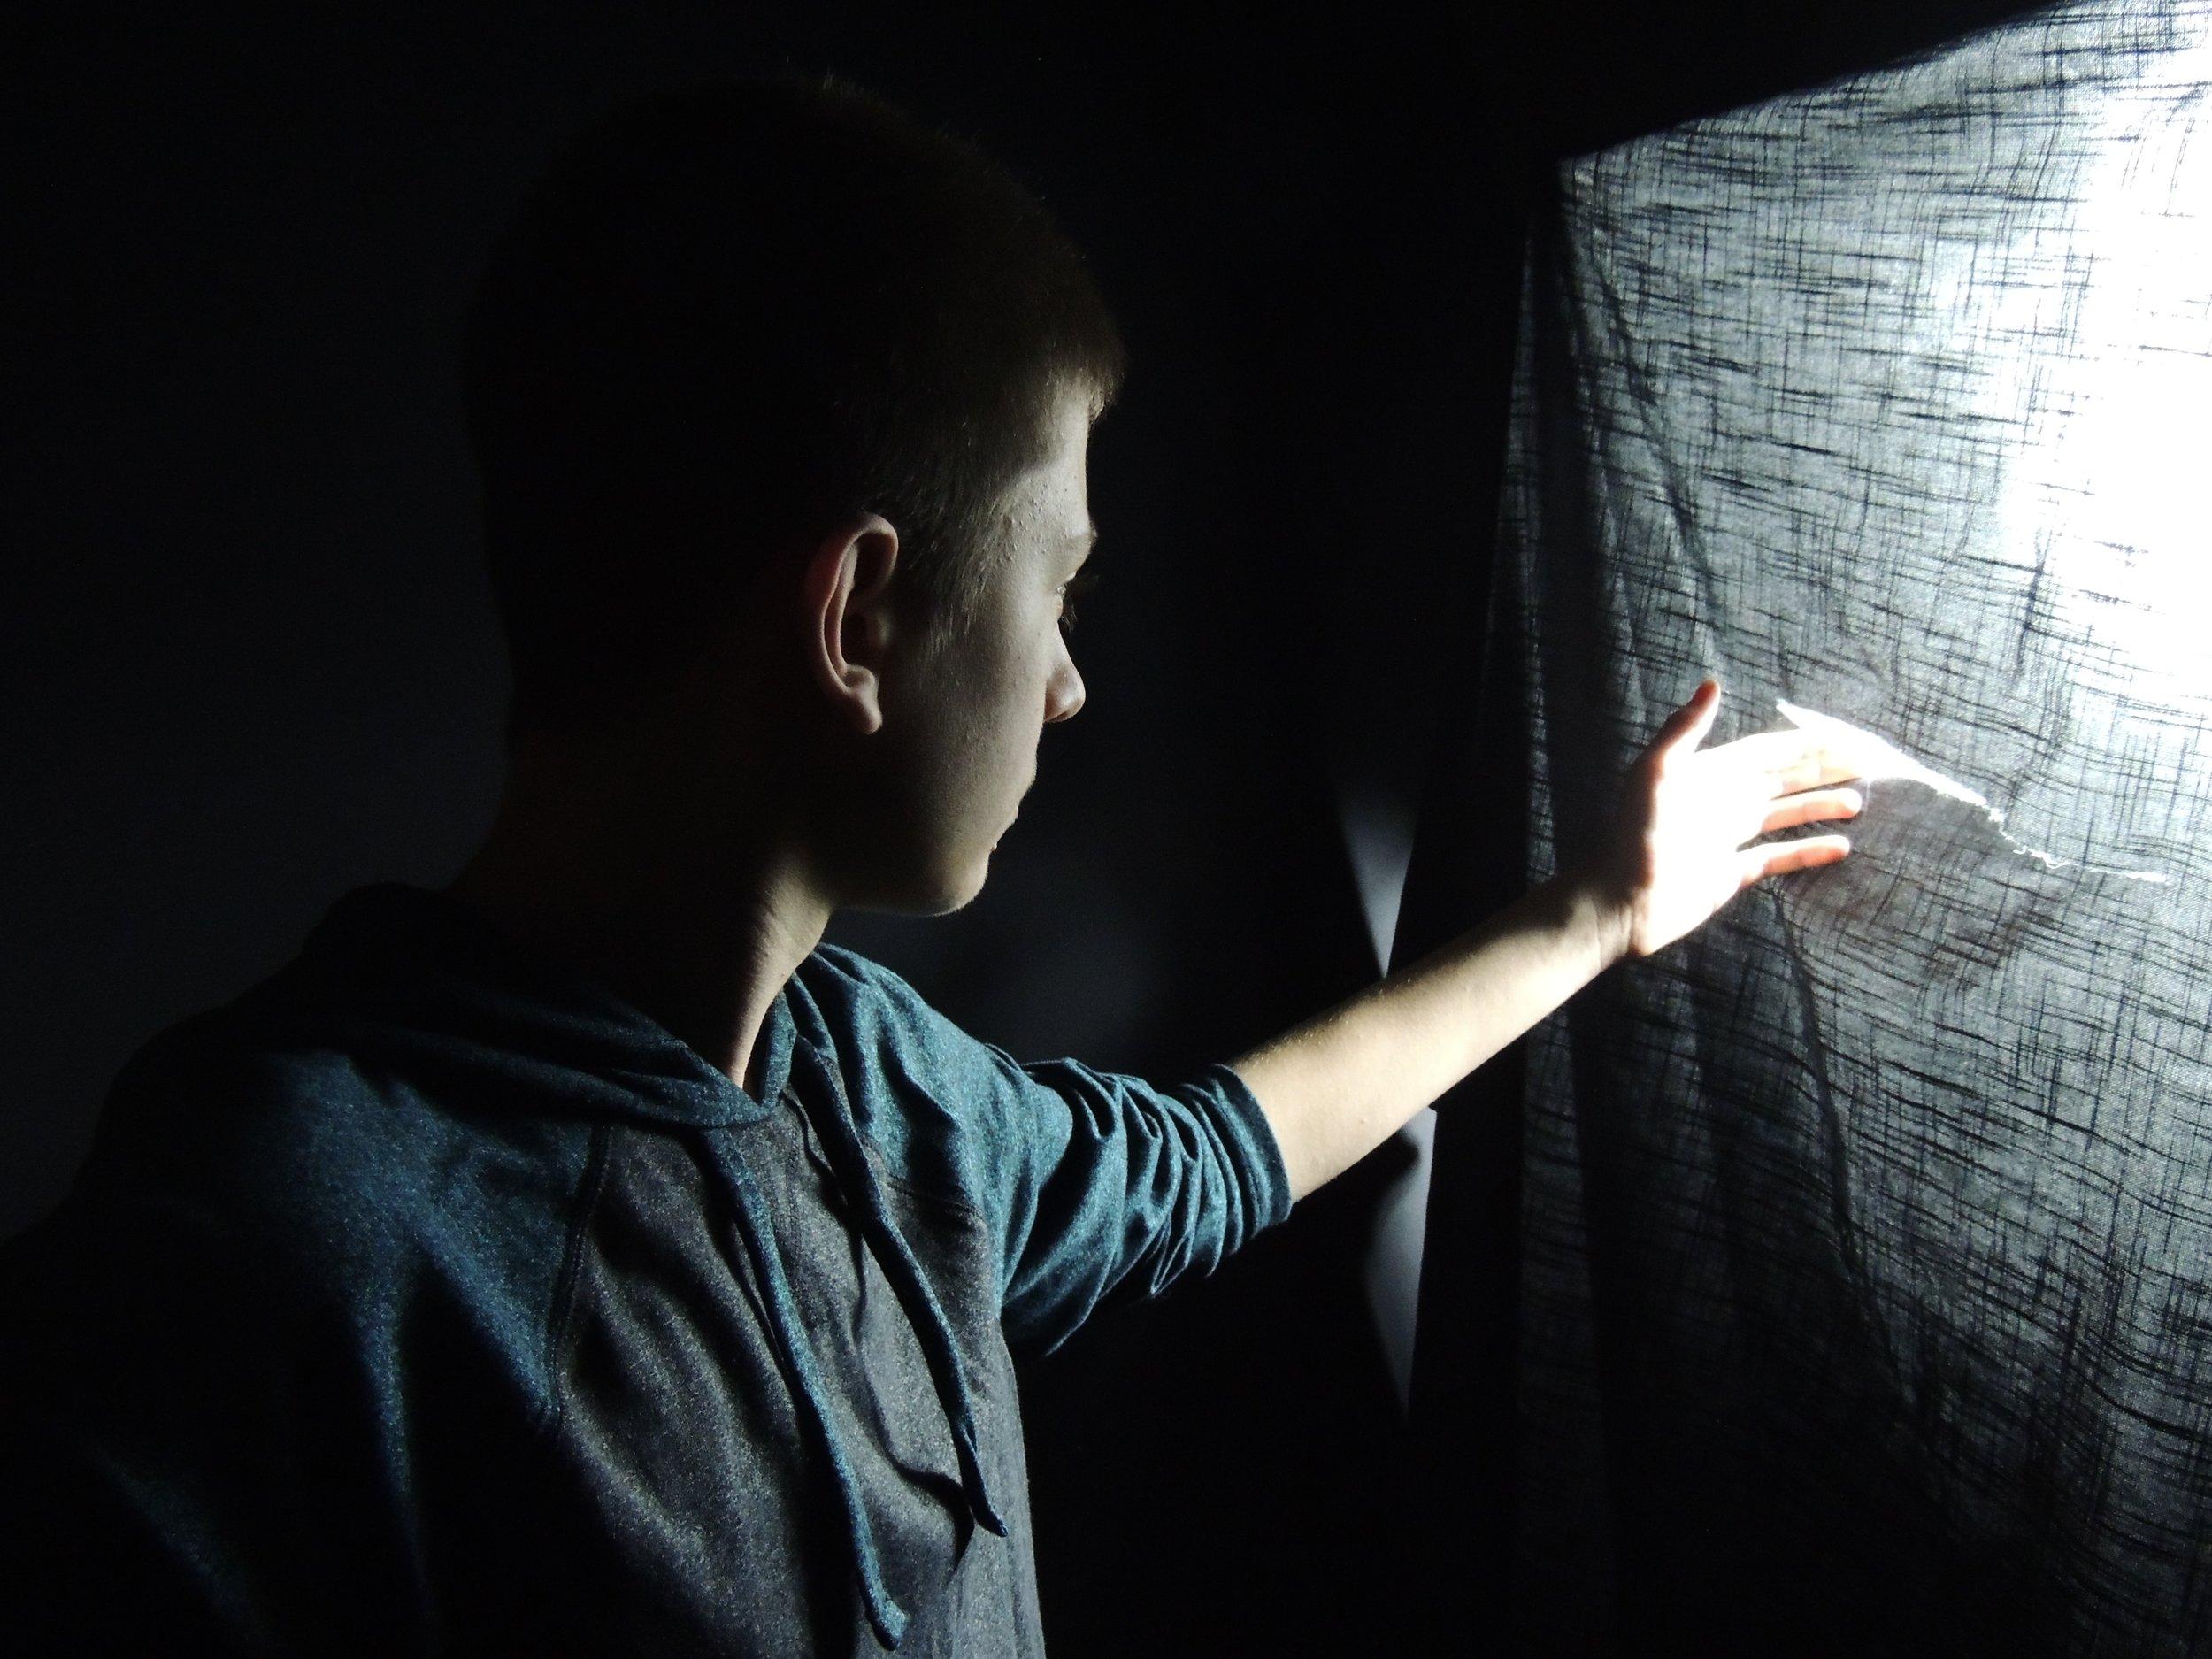 Boy looking at light through tear in sheet